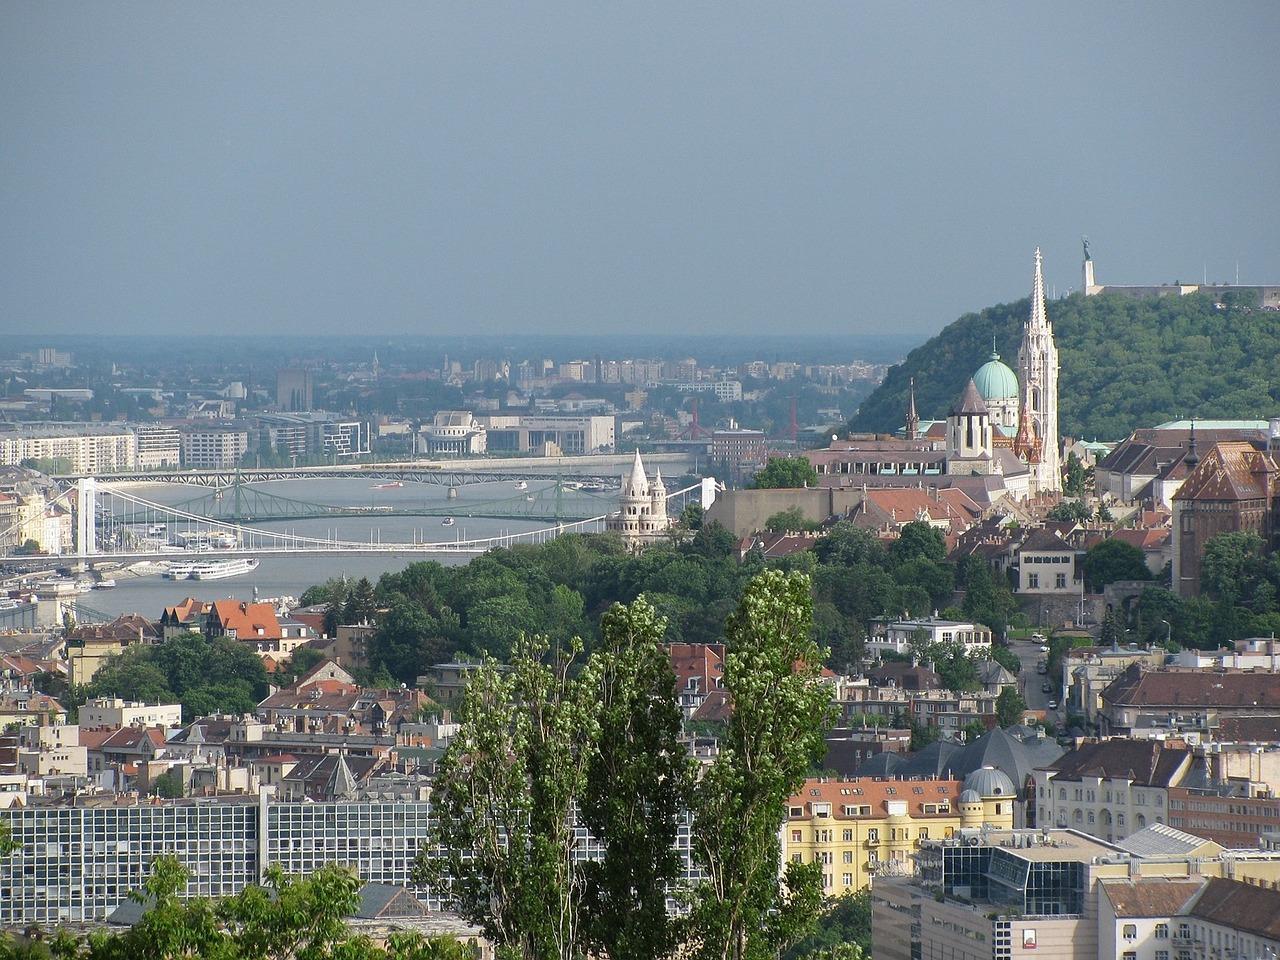 budapest-78785_1280.jpg